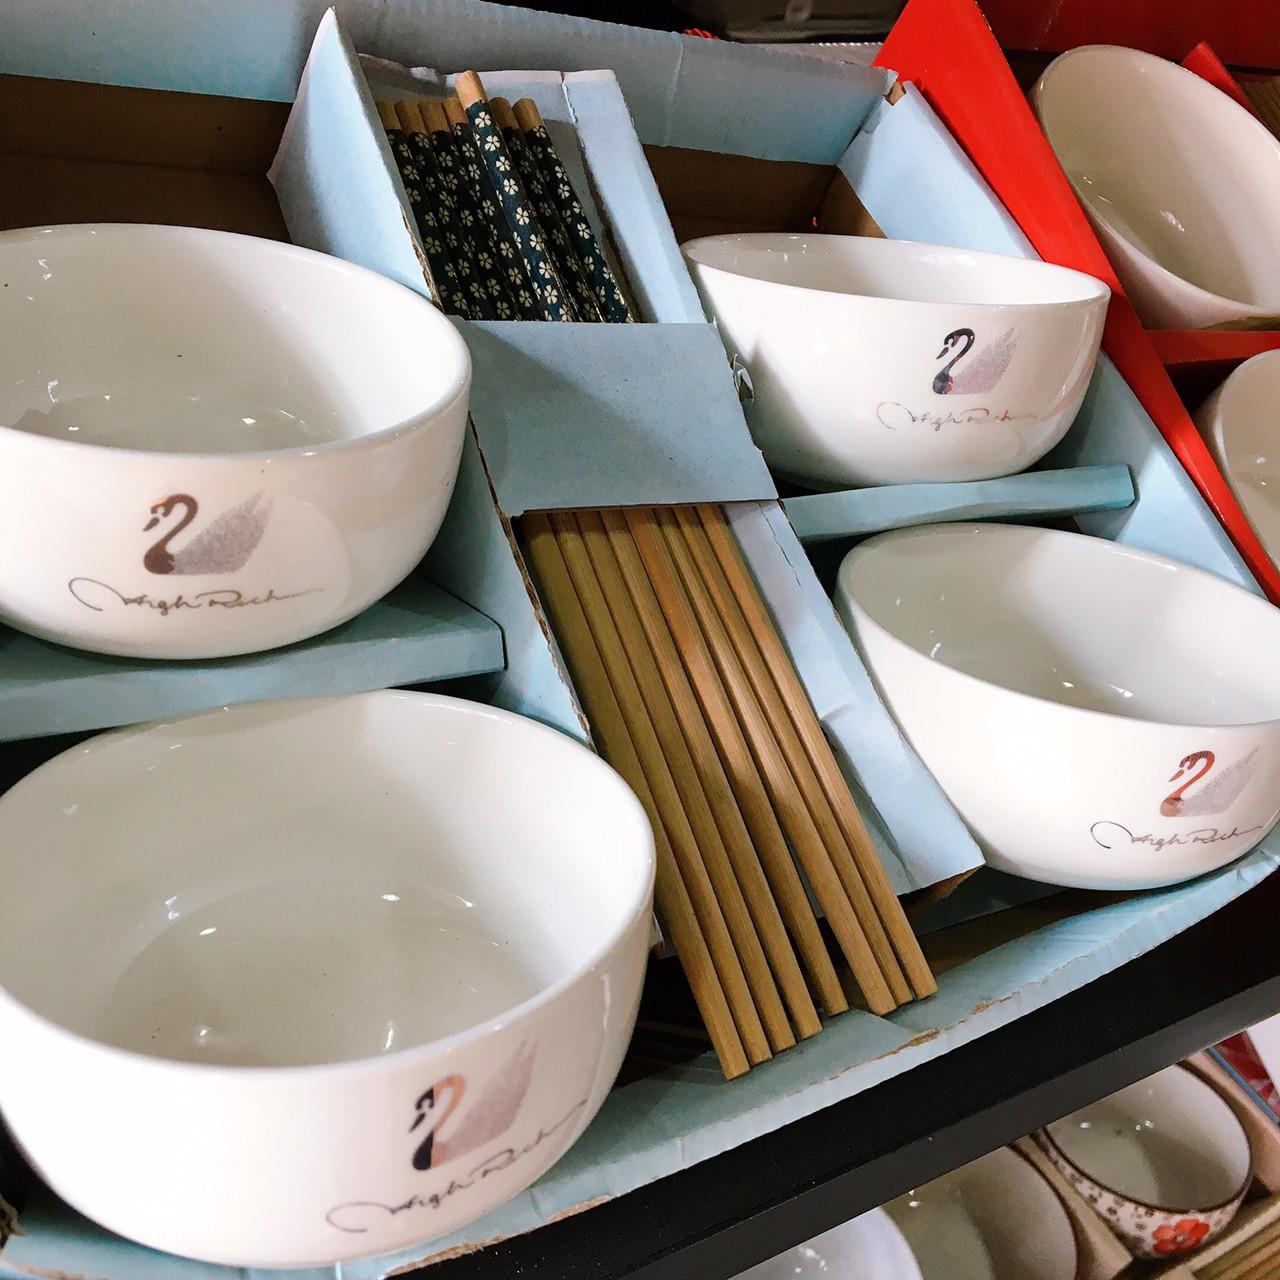 Mana ชุดของขวัญ High Quality Ceramics 108.- ส่งฟรี